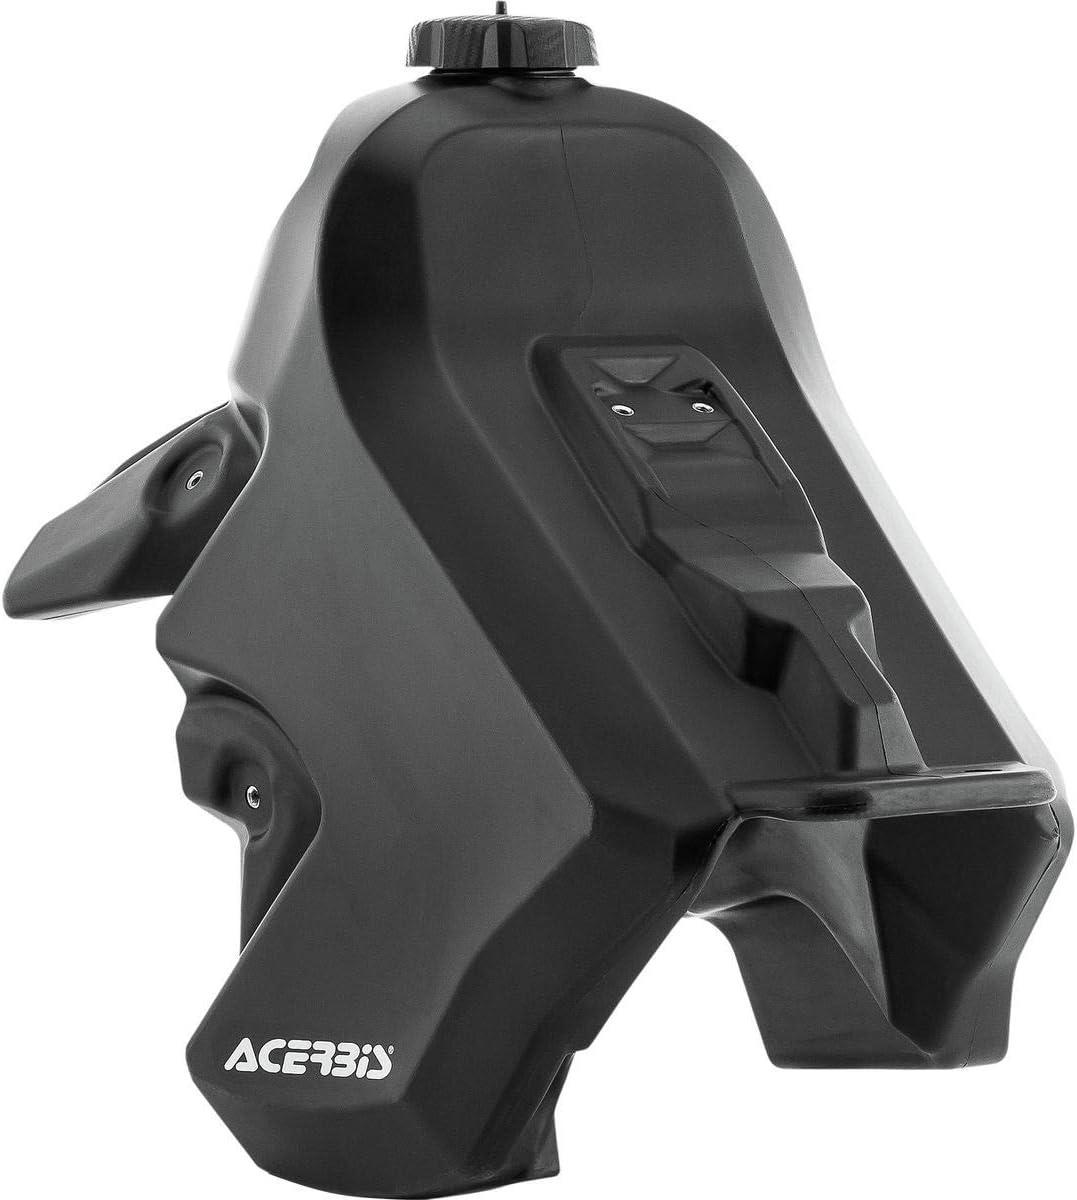 Acerbis 2464810001 Gas Tanks